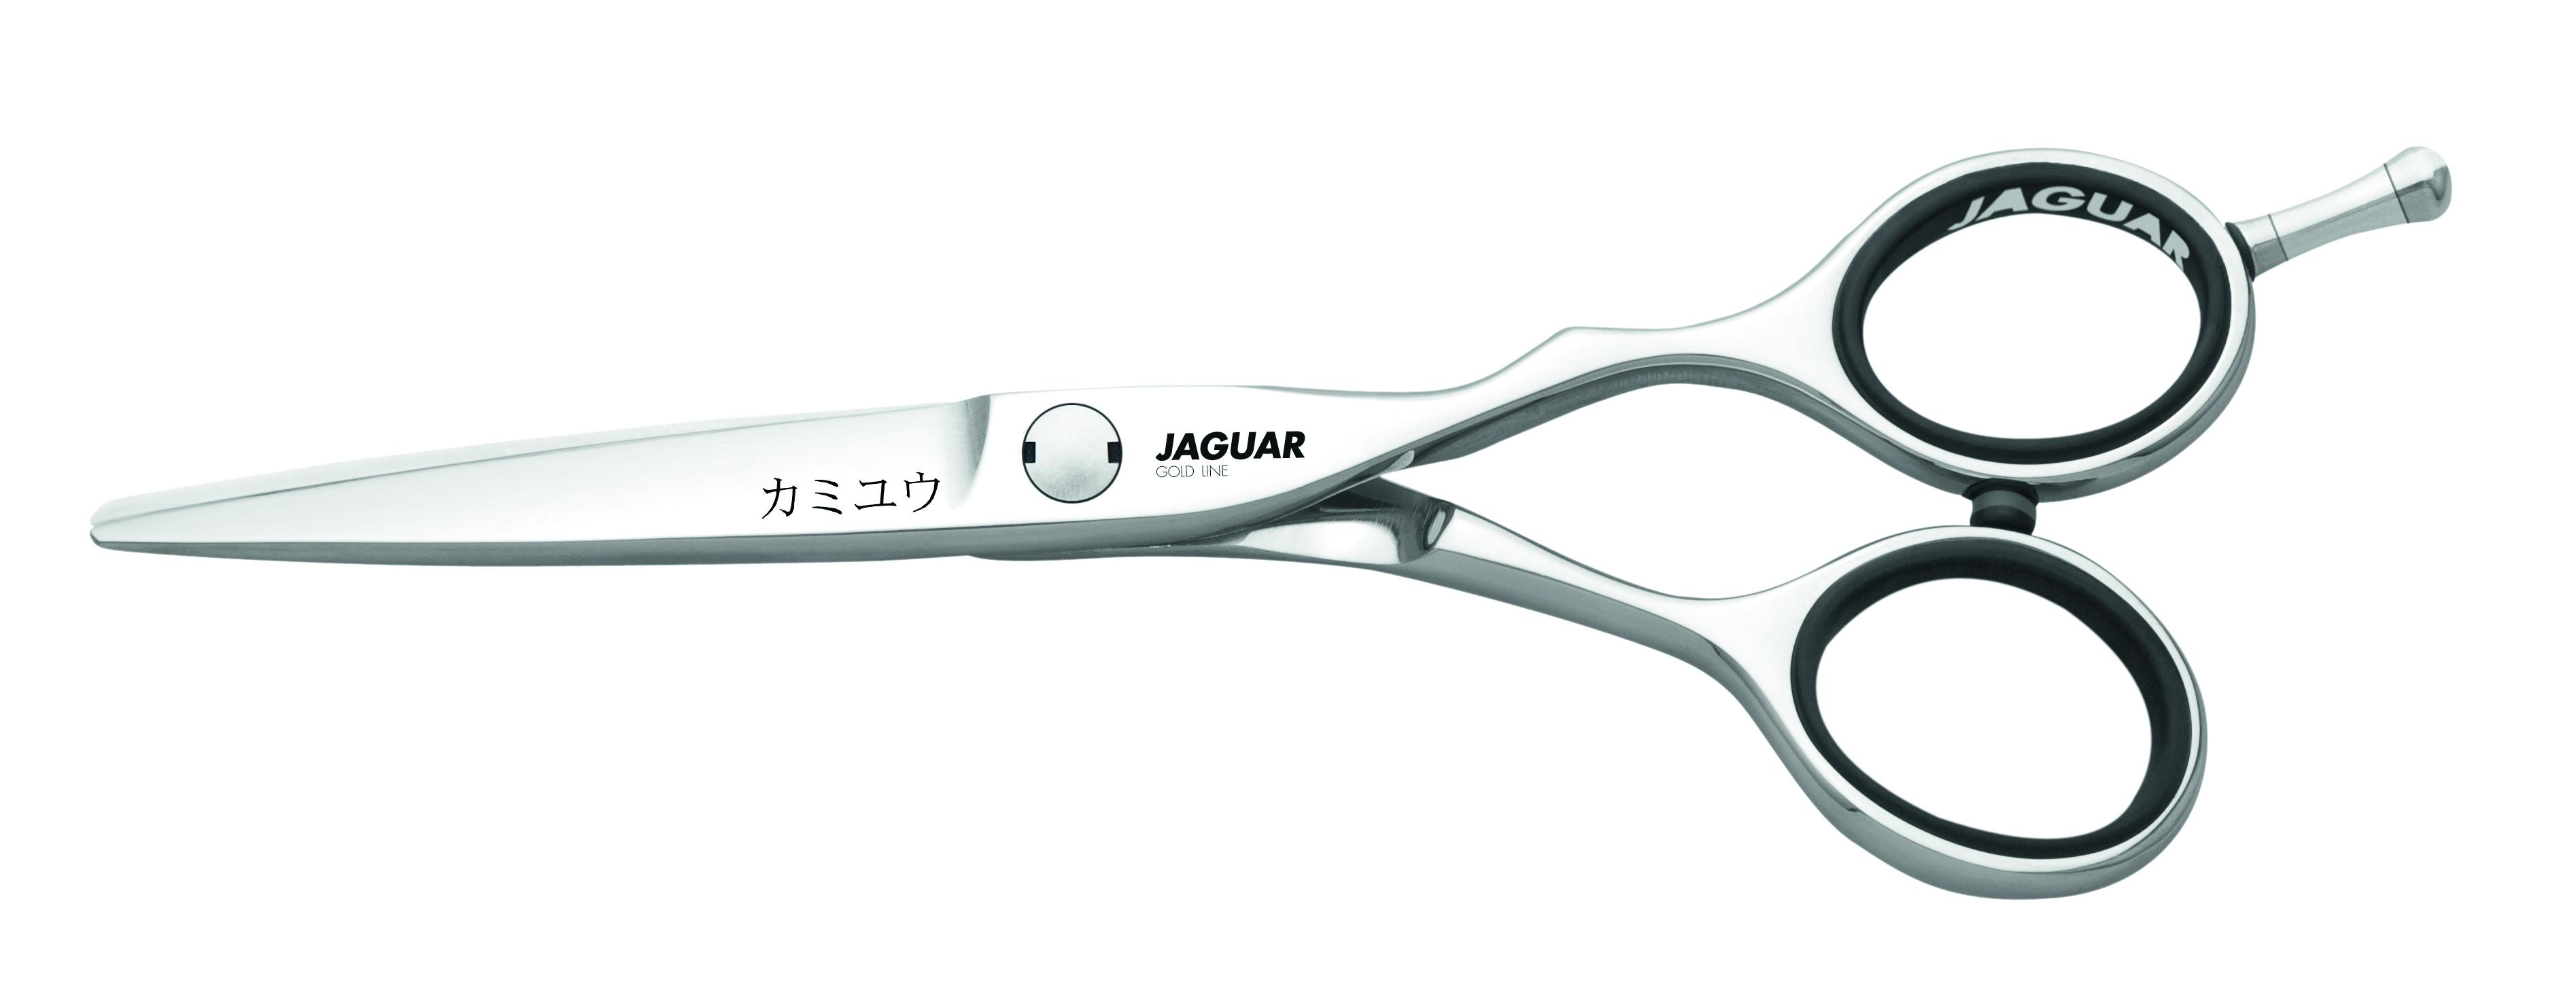 "Ножницы Jaguar Japan Kamiyu (5,75""/15cm) *****"